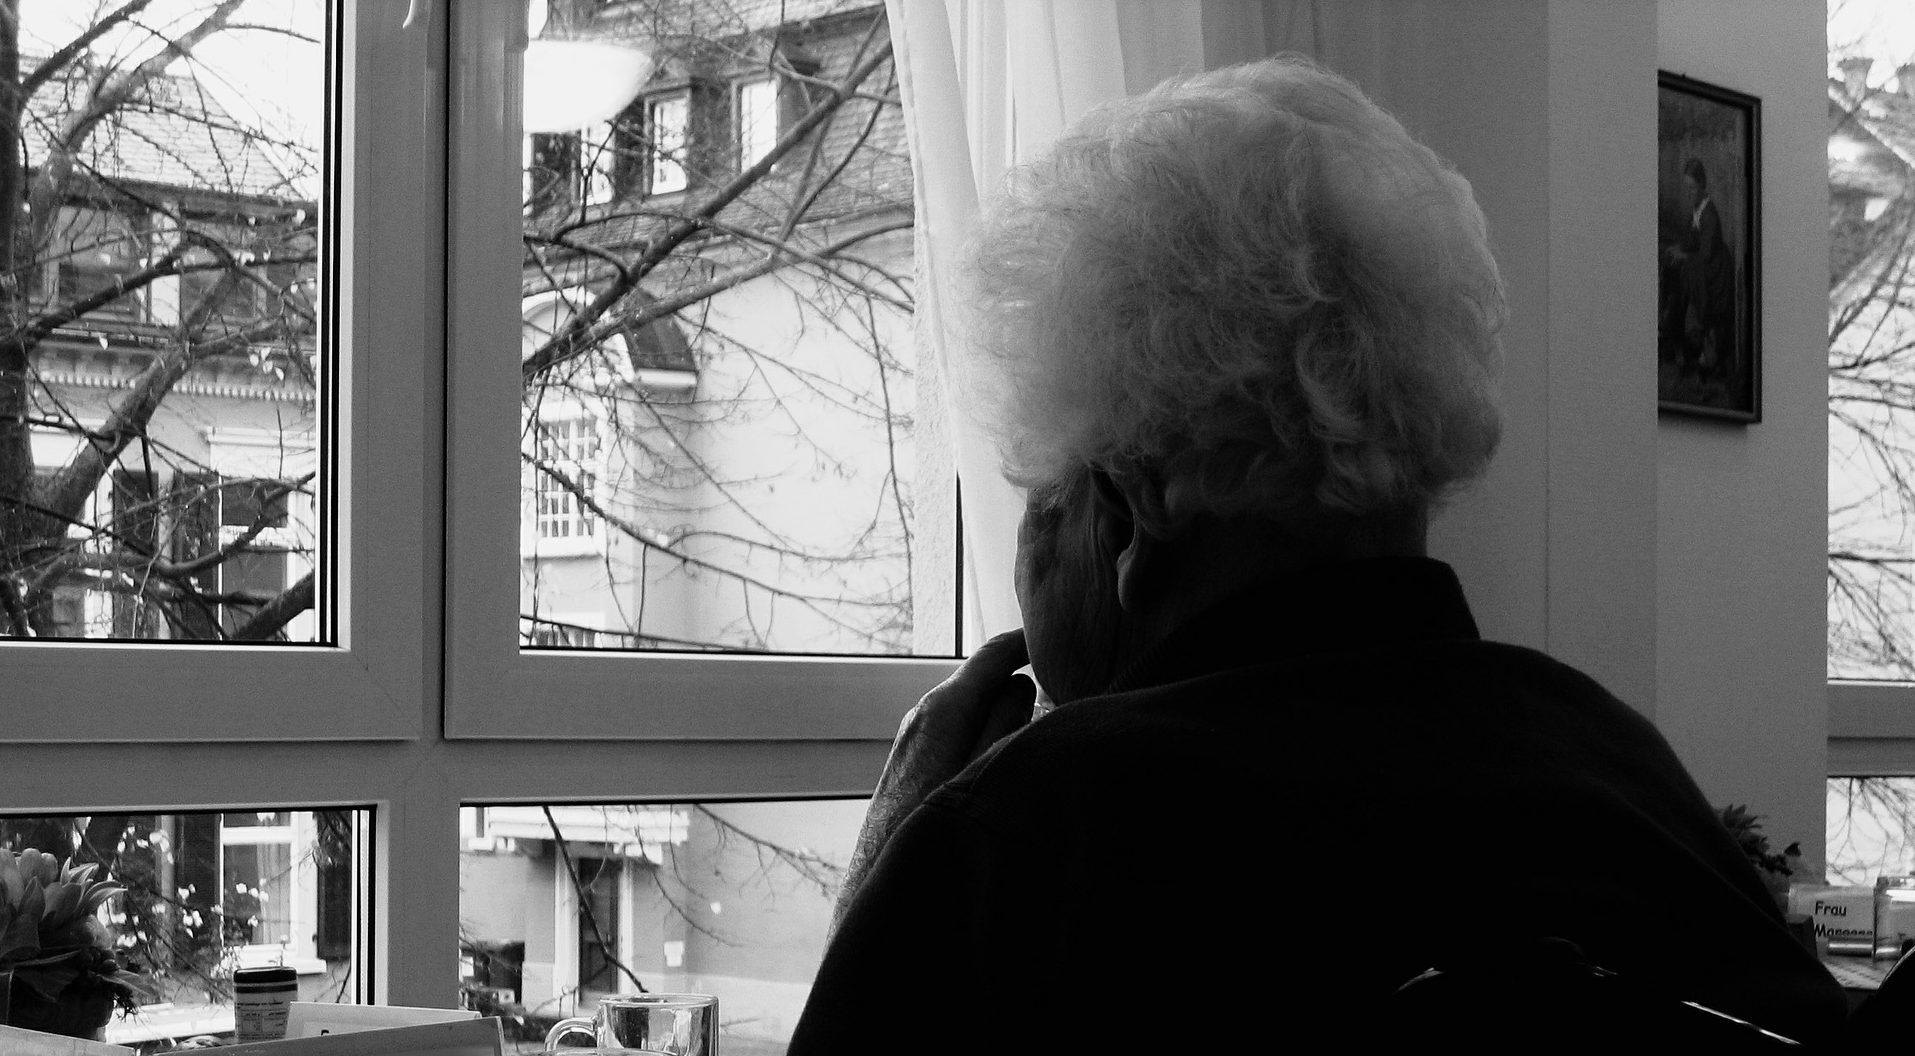 Seniorin am Fenster